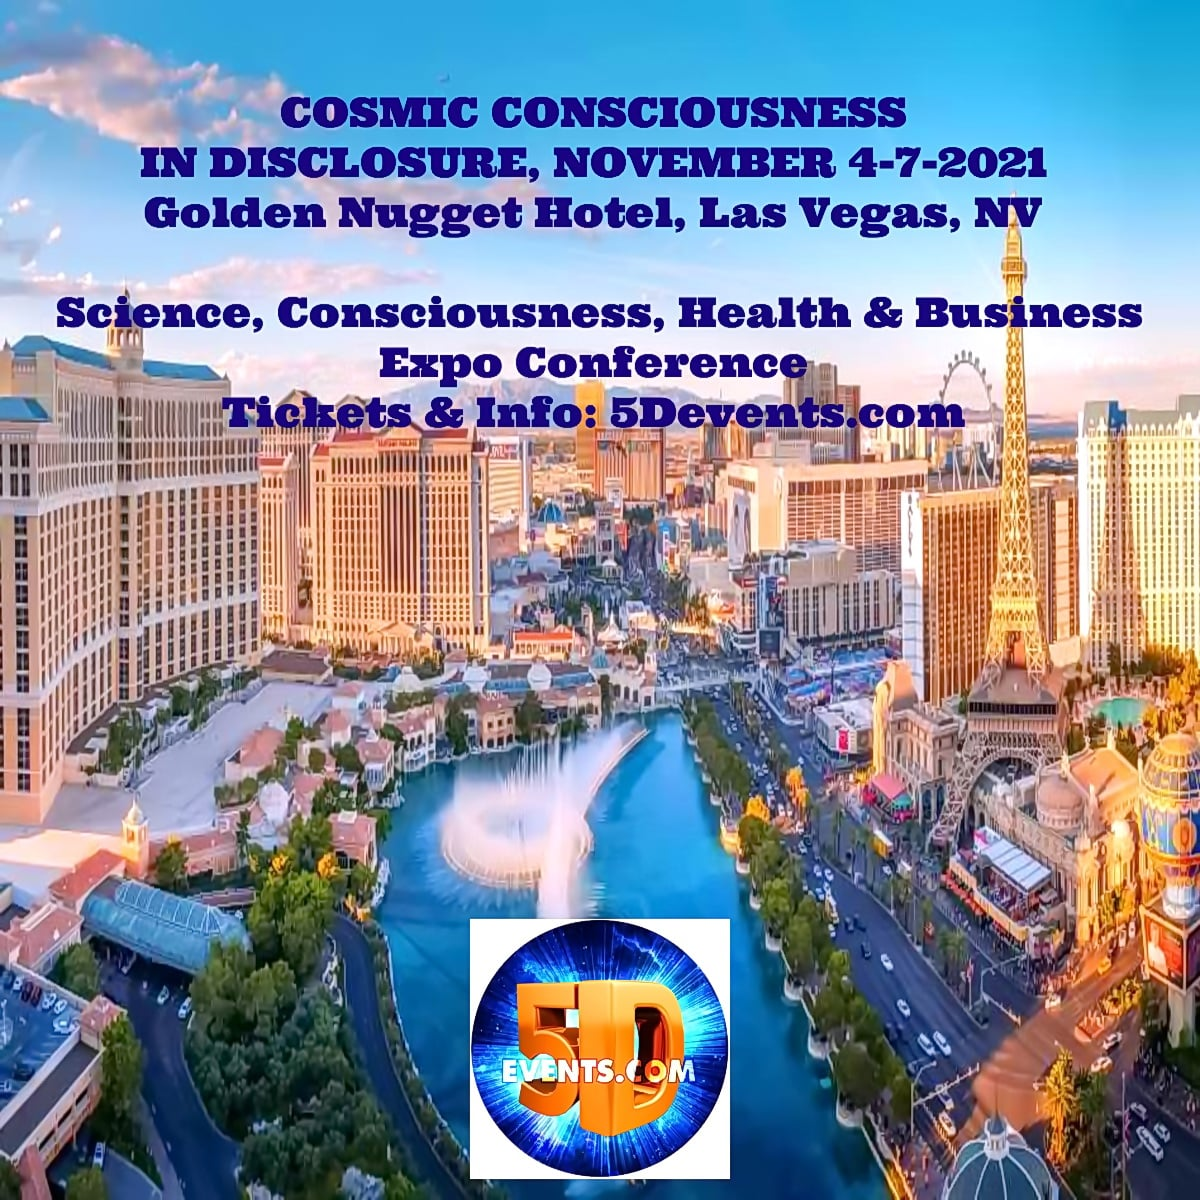 COSMIC CONSCIOUSNESS IN DISCLOSURE – James Rink Speaker Event – NOVEMBER 4-7-2021